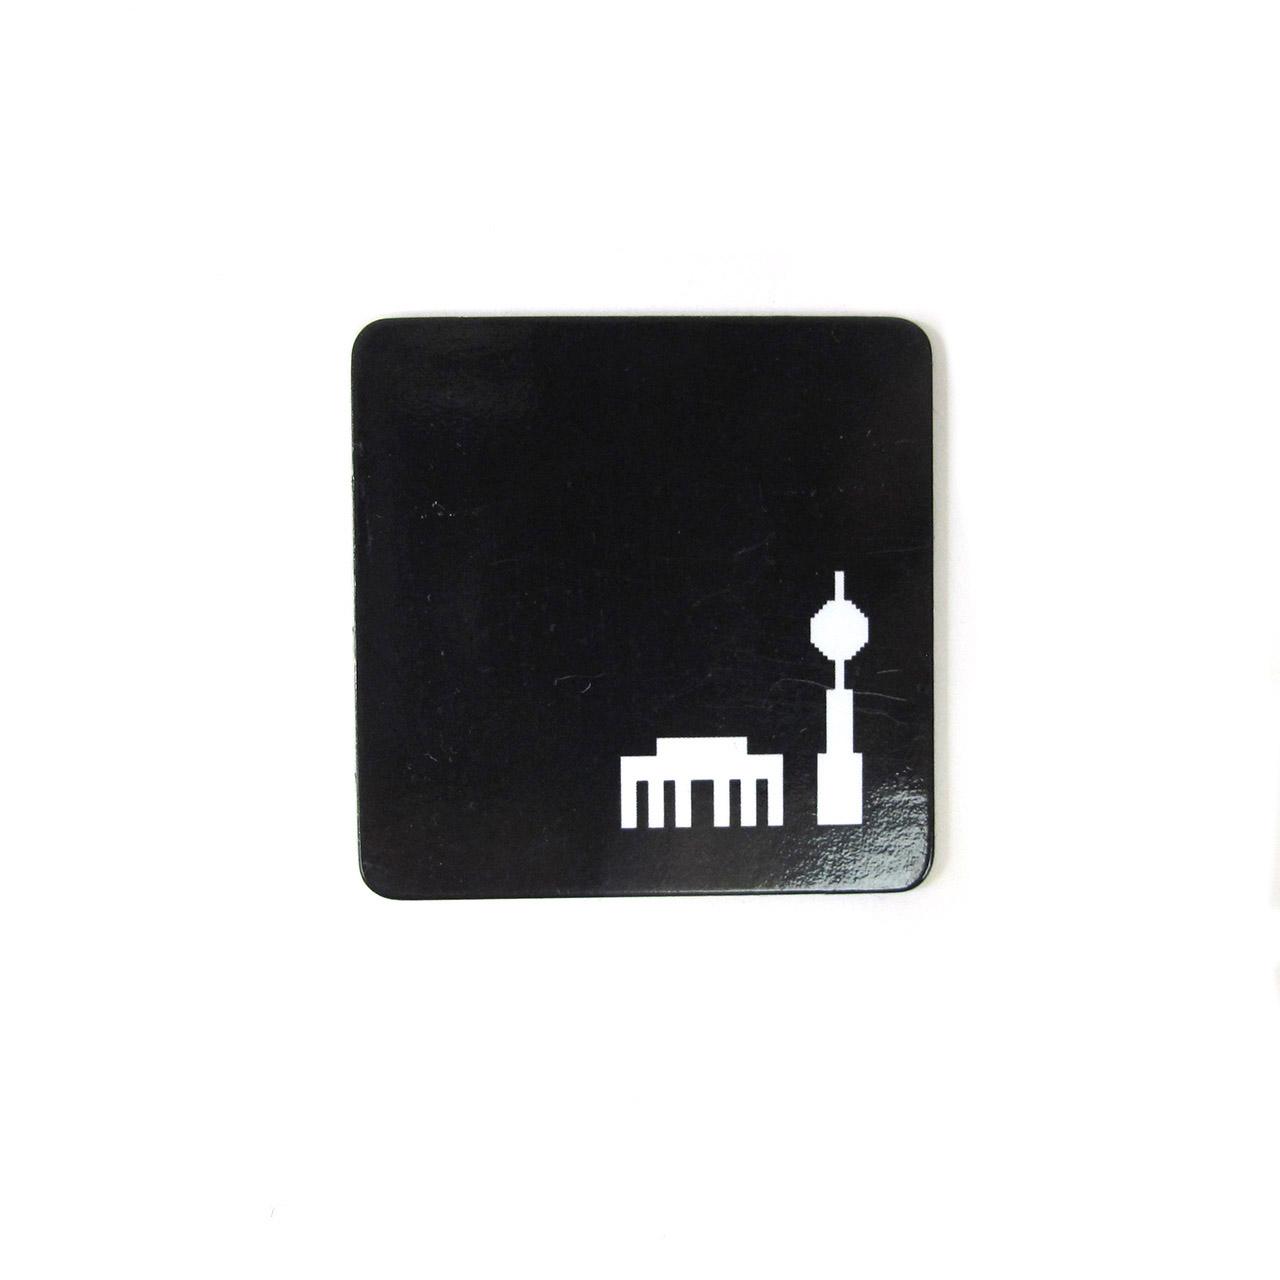 Berlinmagnet Tor + Turm schwarz